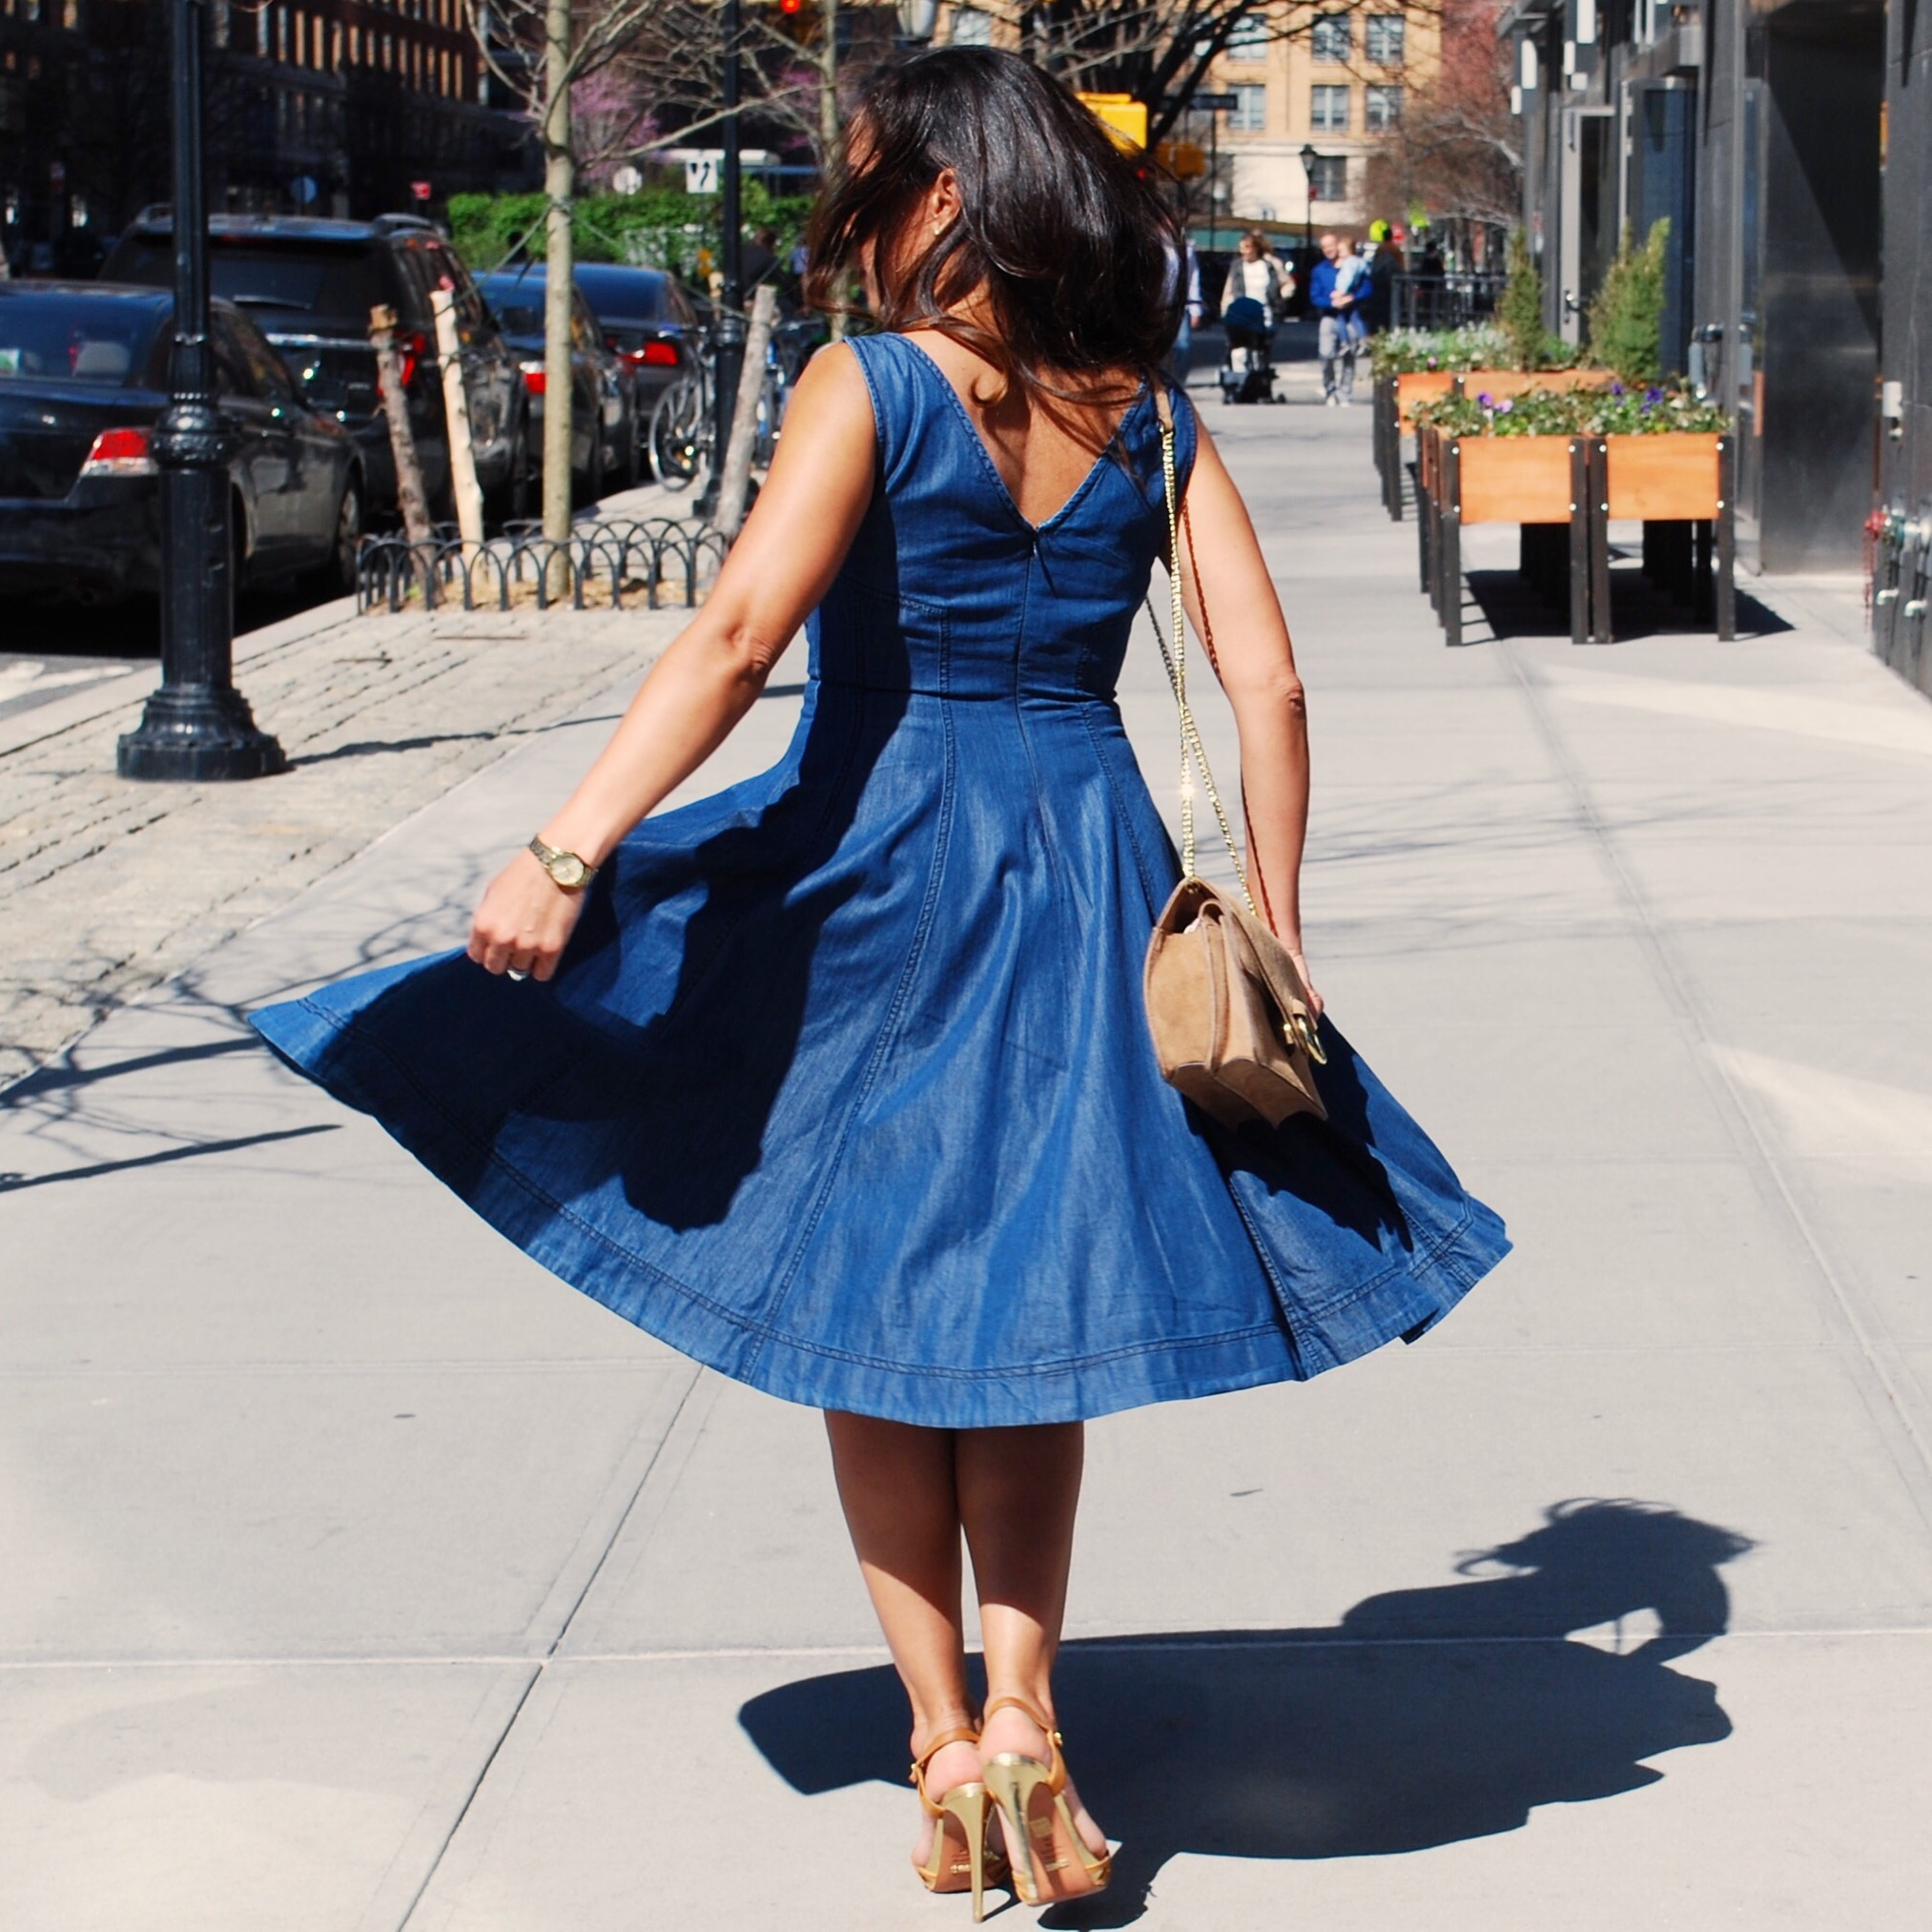 Sunday Brunch // Lady in the Denim Dress